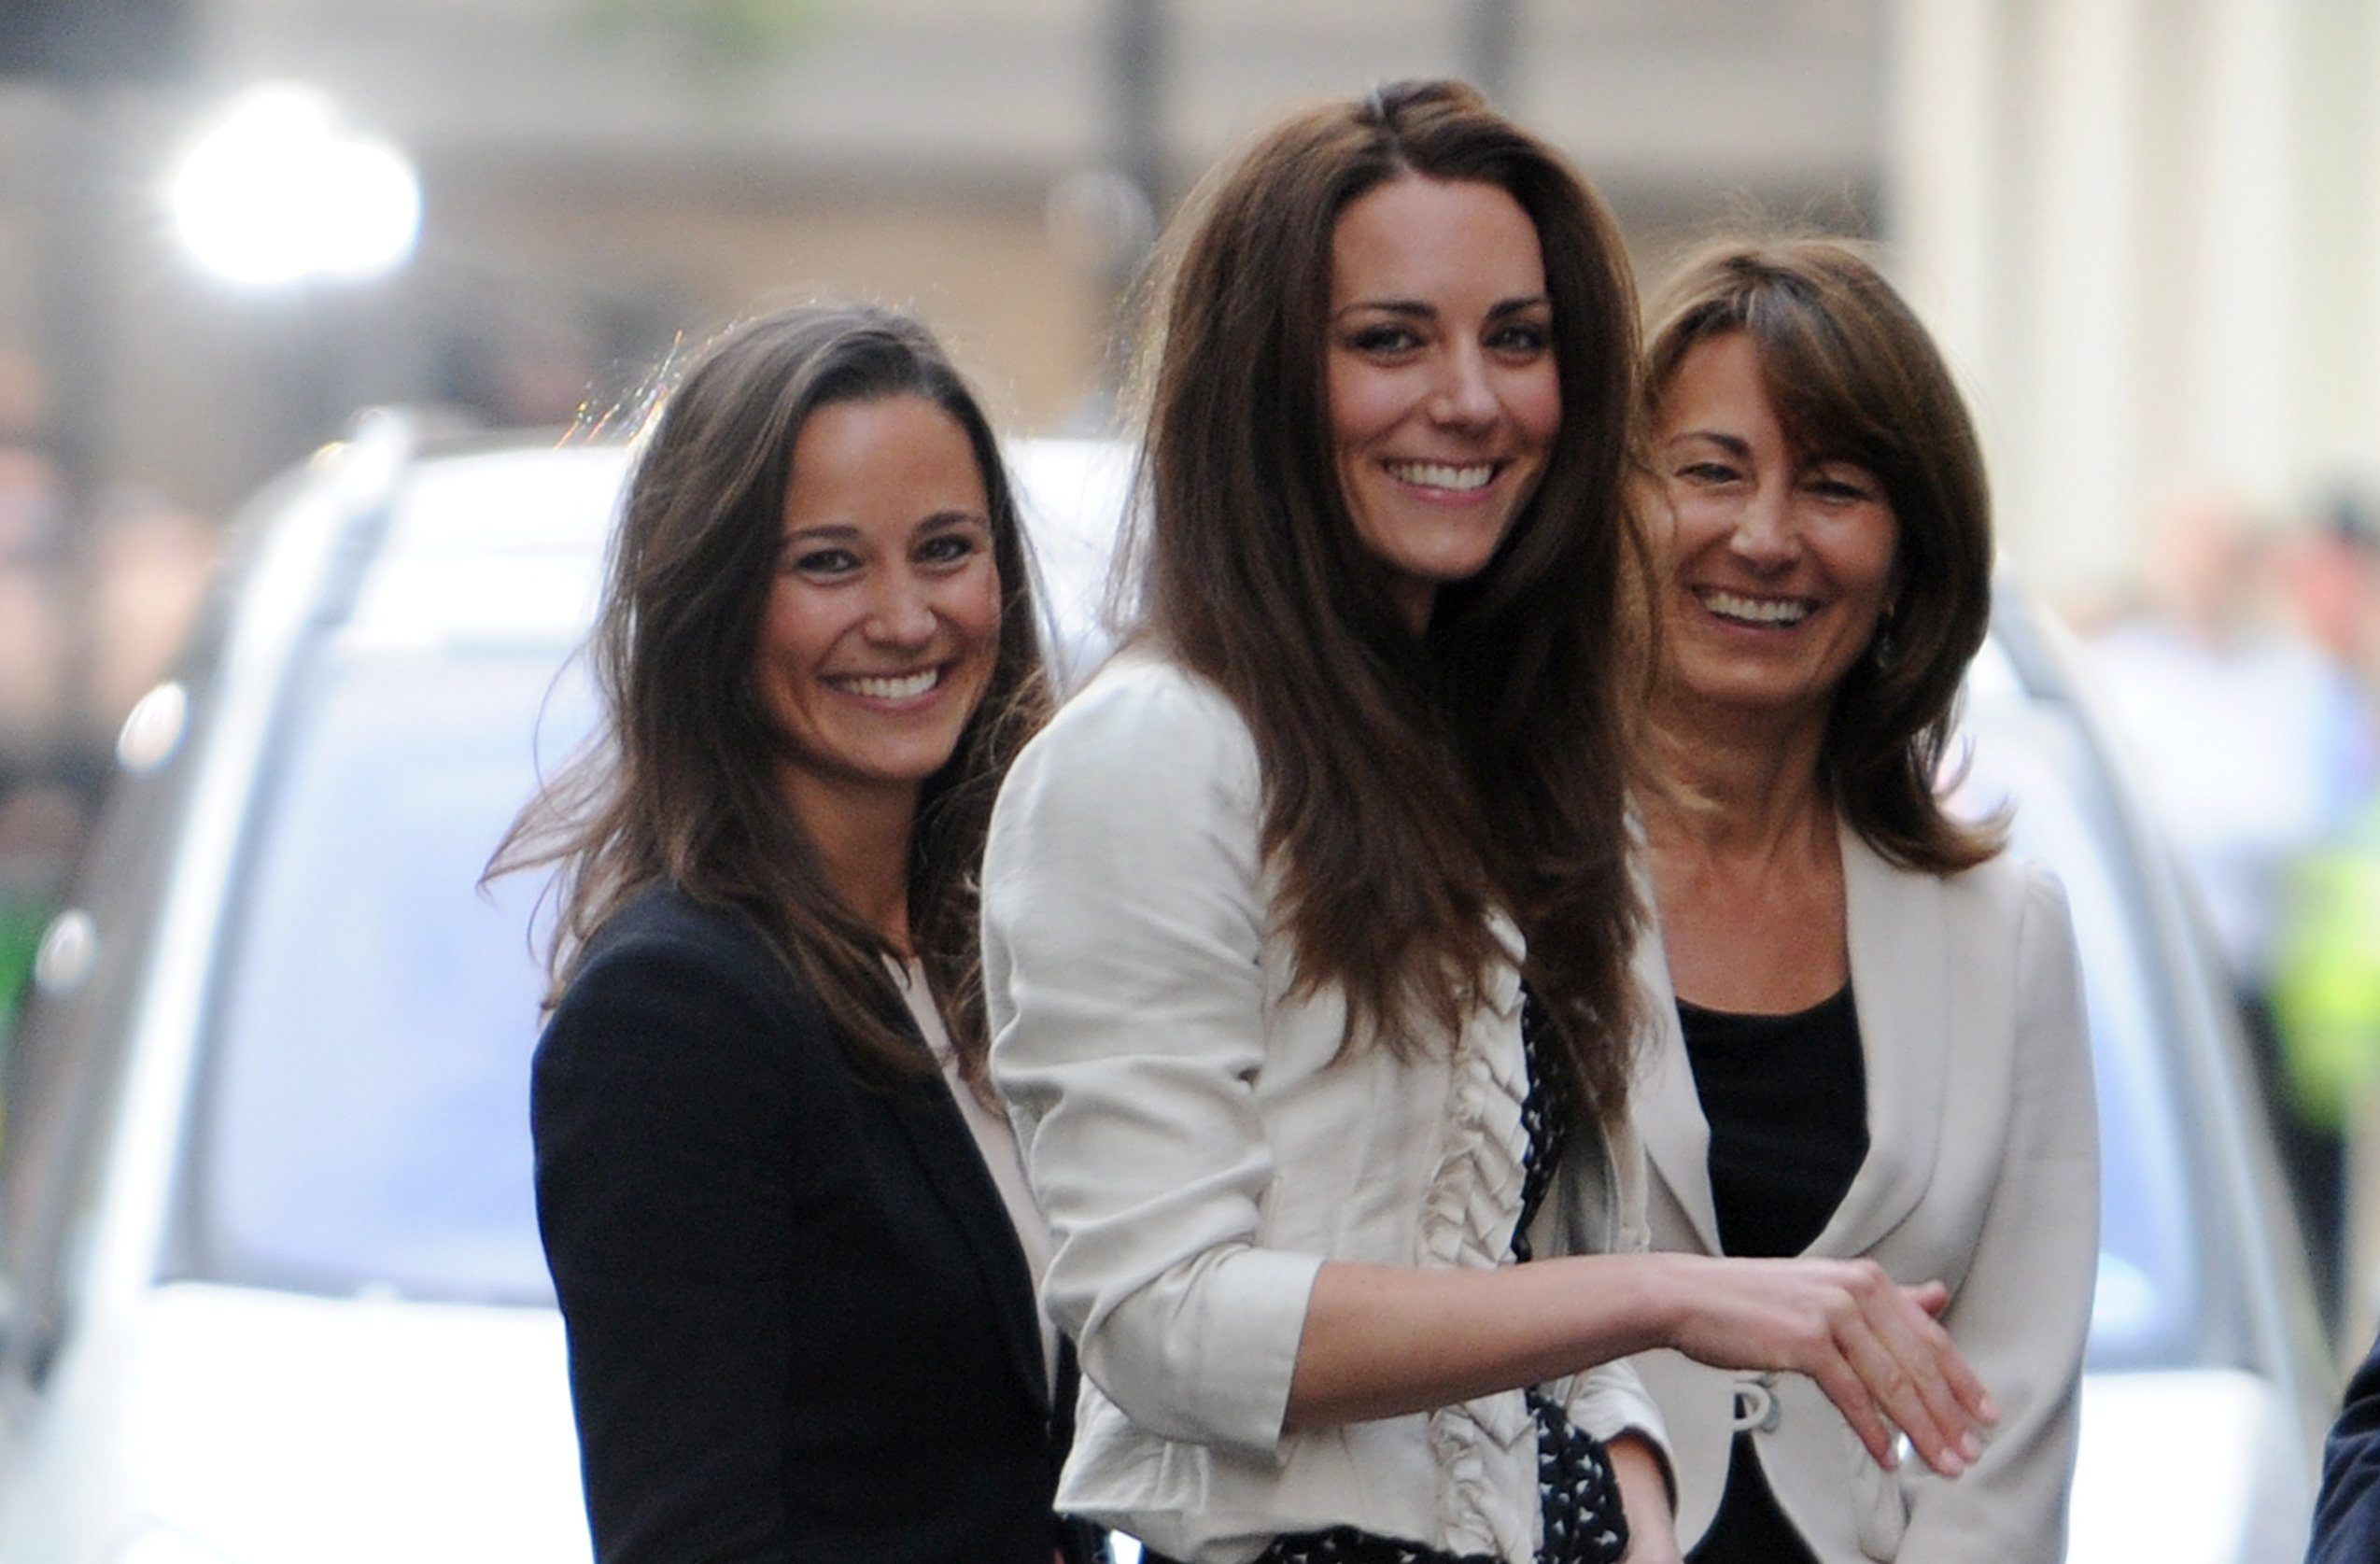 Kate Middleton, lo zio Gary Goldsmith dà scandalo: ubriaco, urina sui muri